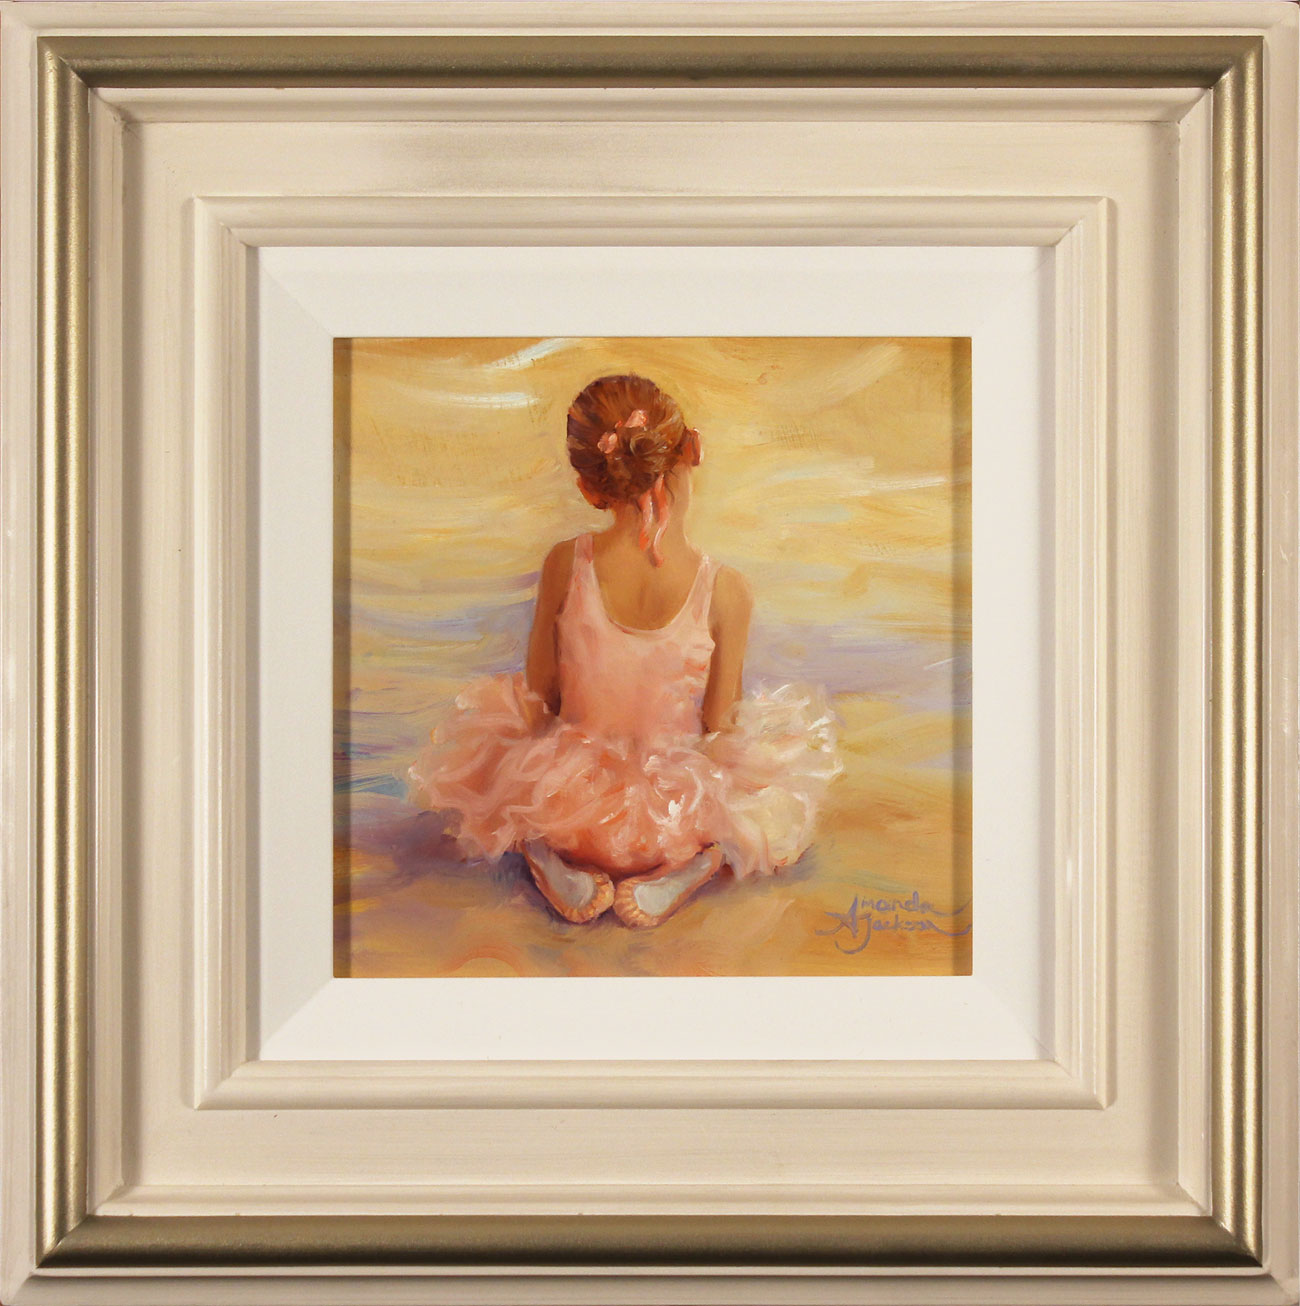 Amanda Jackson, Original oil painting on panel, Daydreamer, click to enlarge